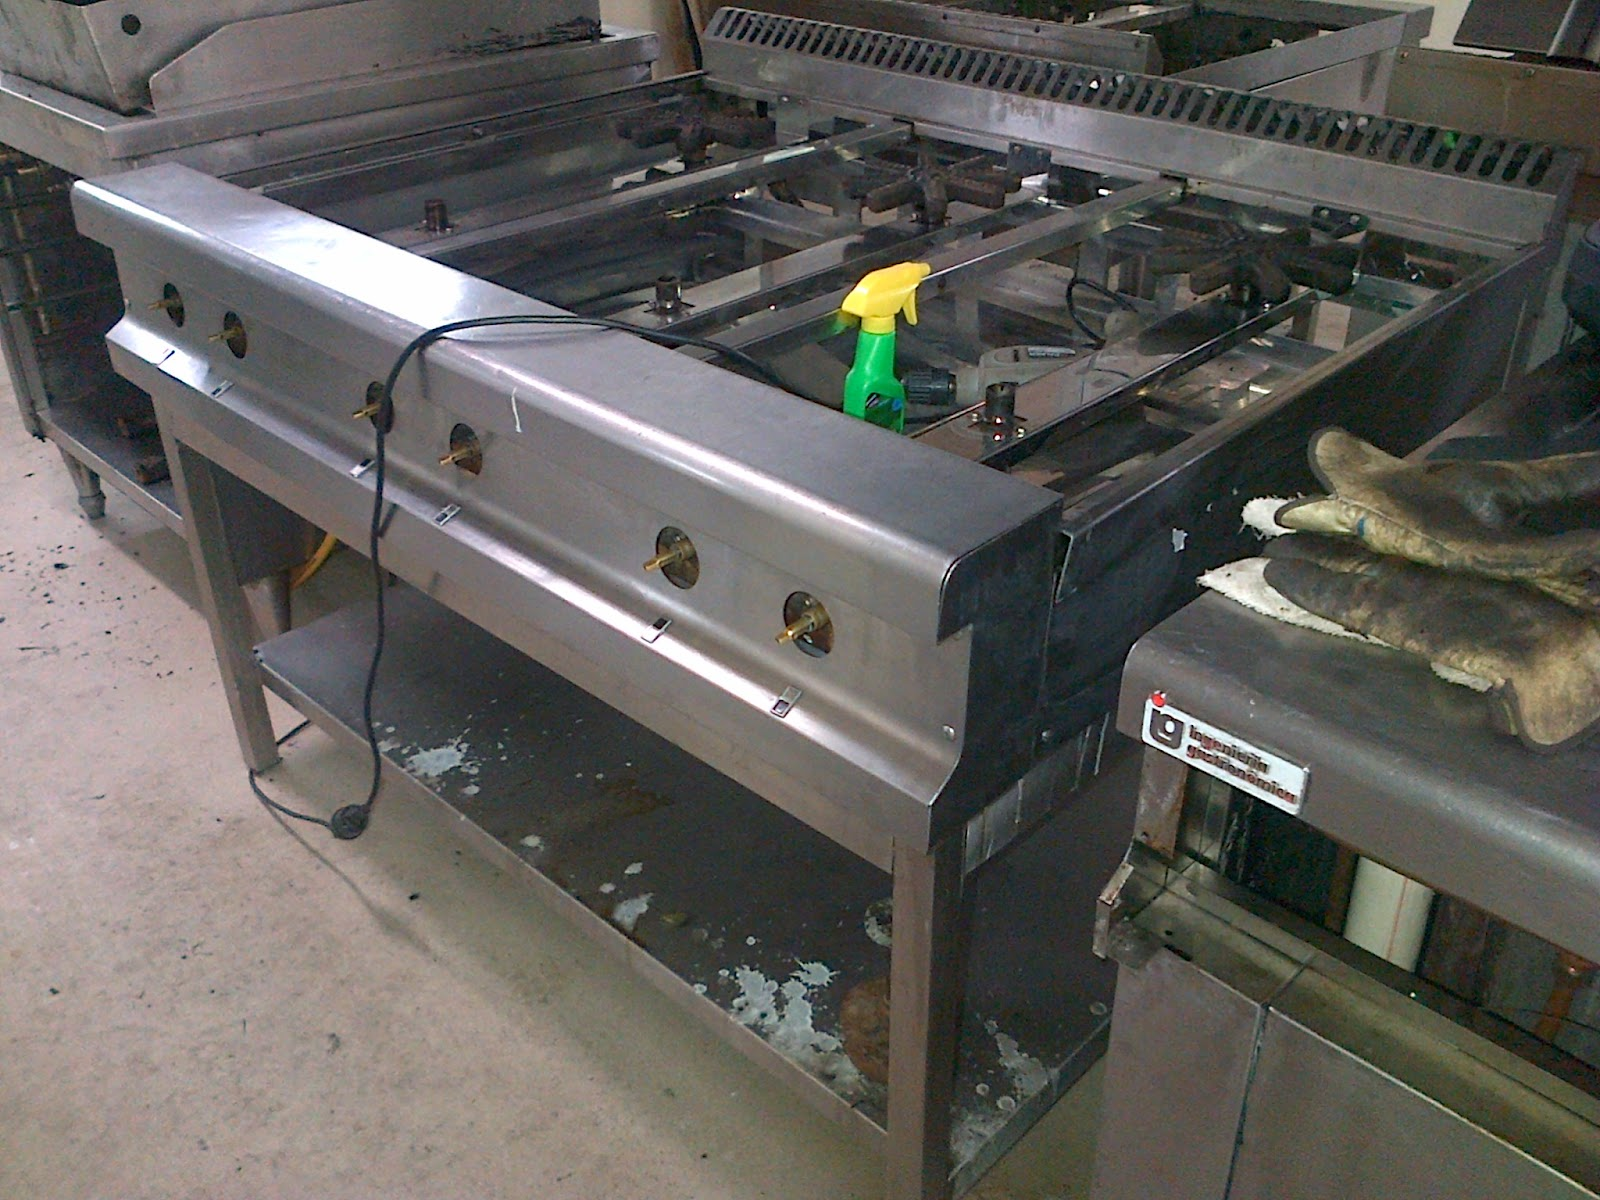 Mantenimiento de estufas a gas sistema de aire acondicionado for Freidoras a gas medellin